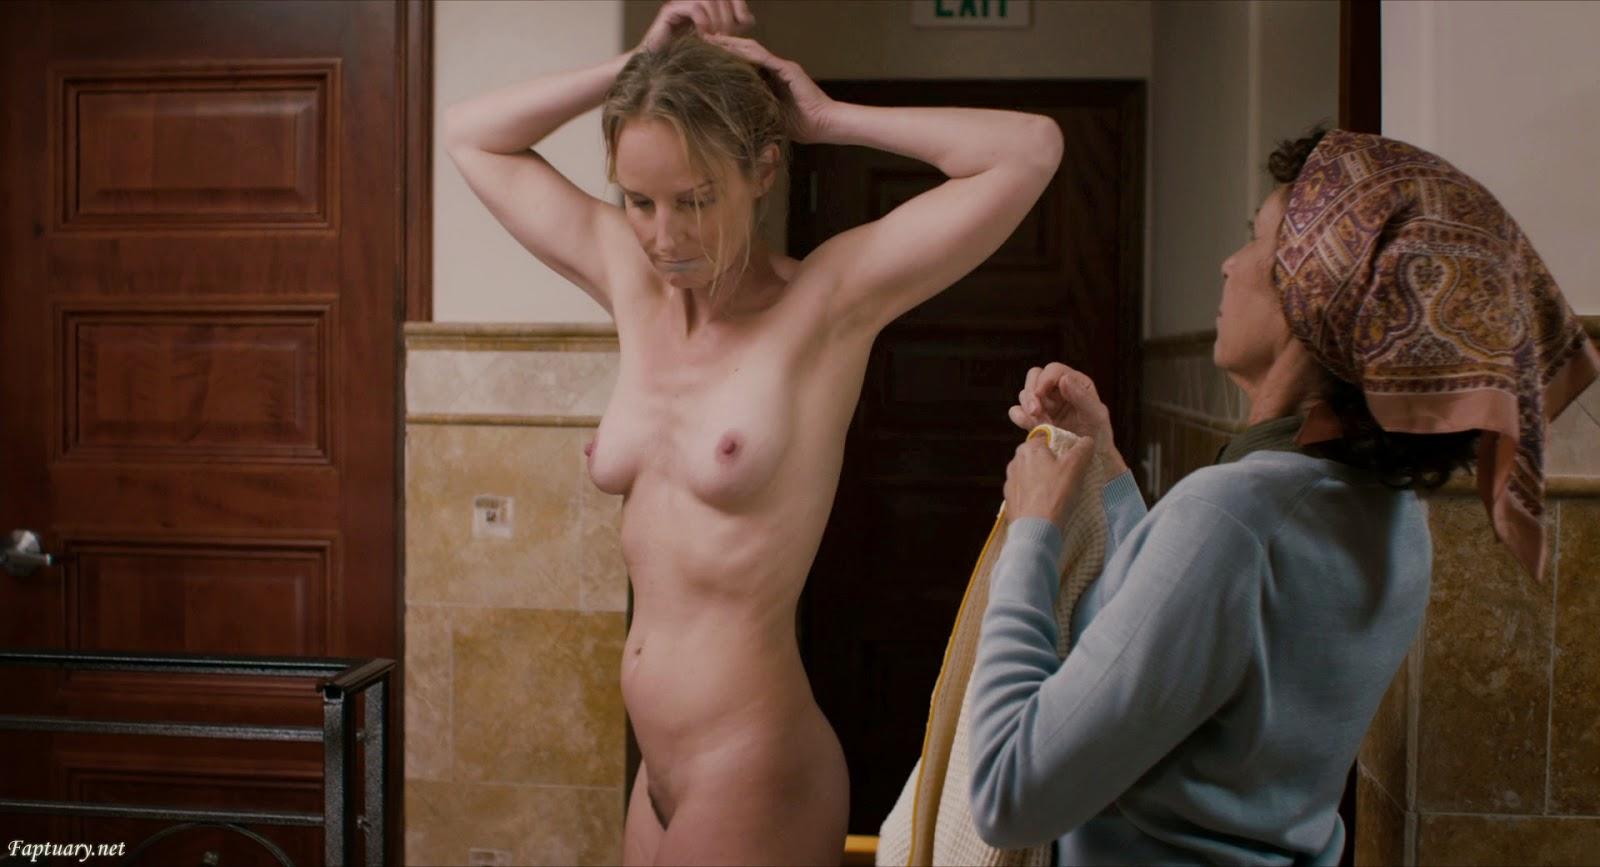 Lindsay marie penthouse